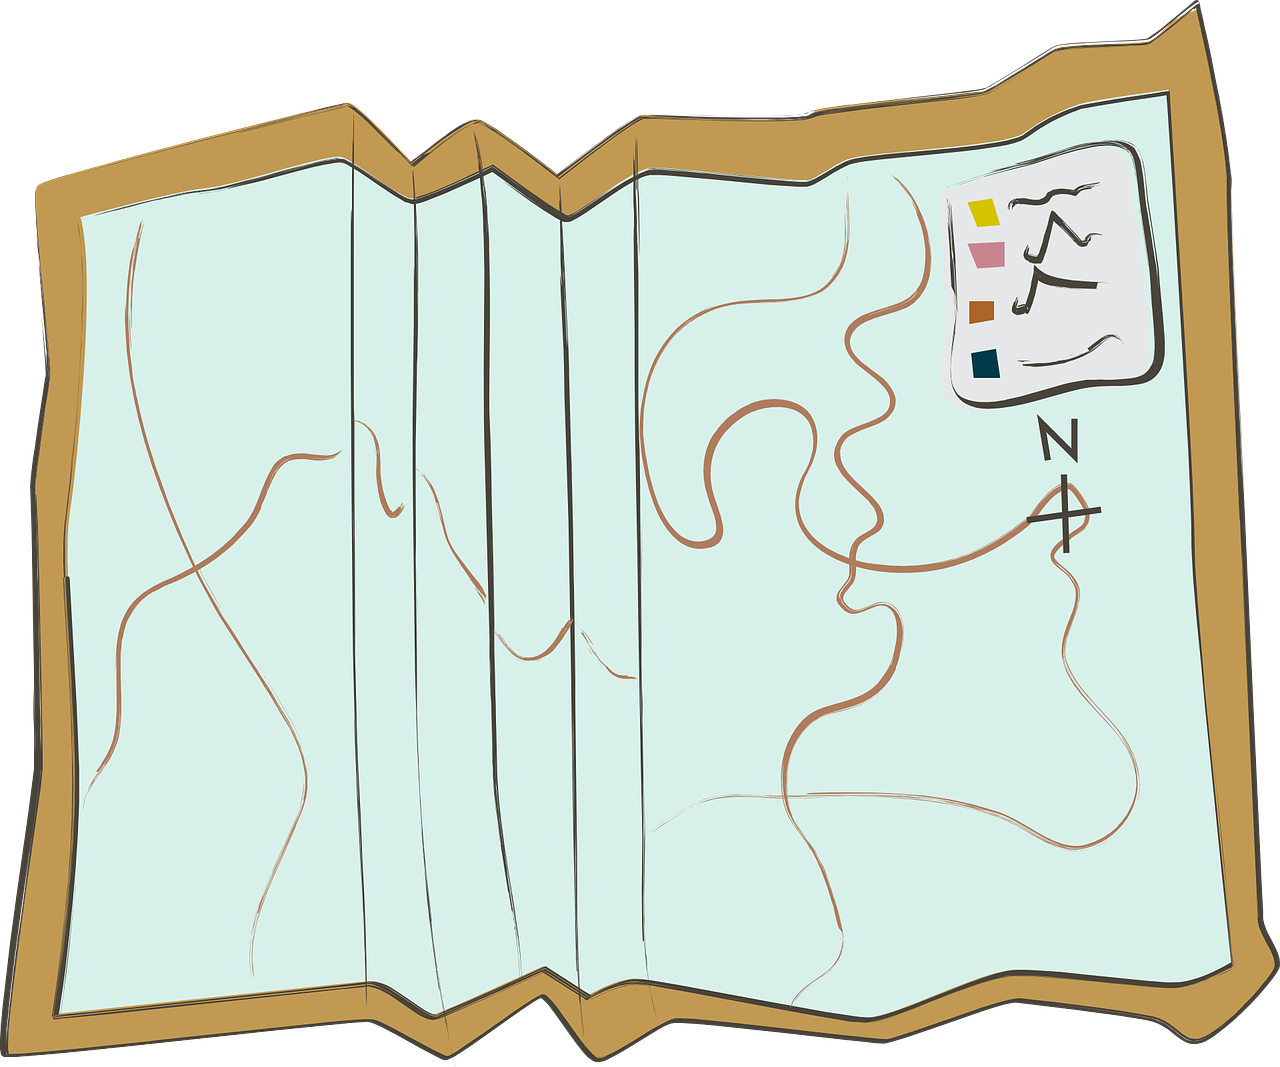 Travel design document global. Clipart map treasure hunt